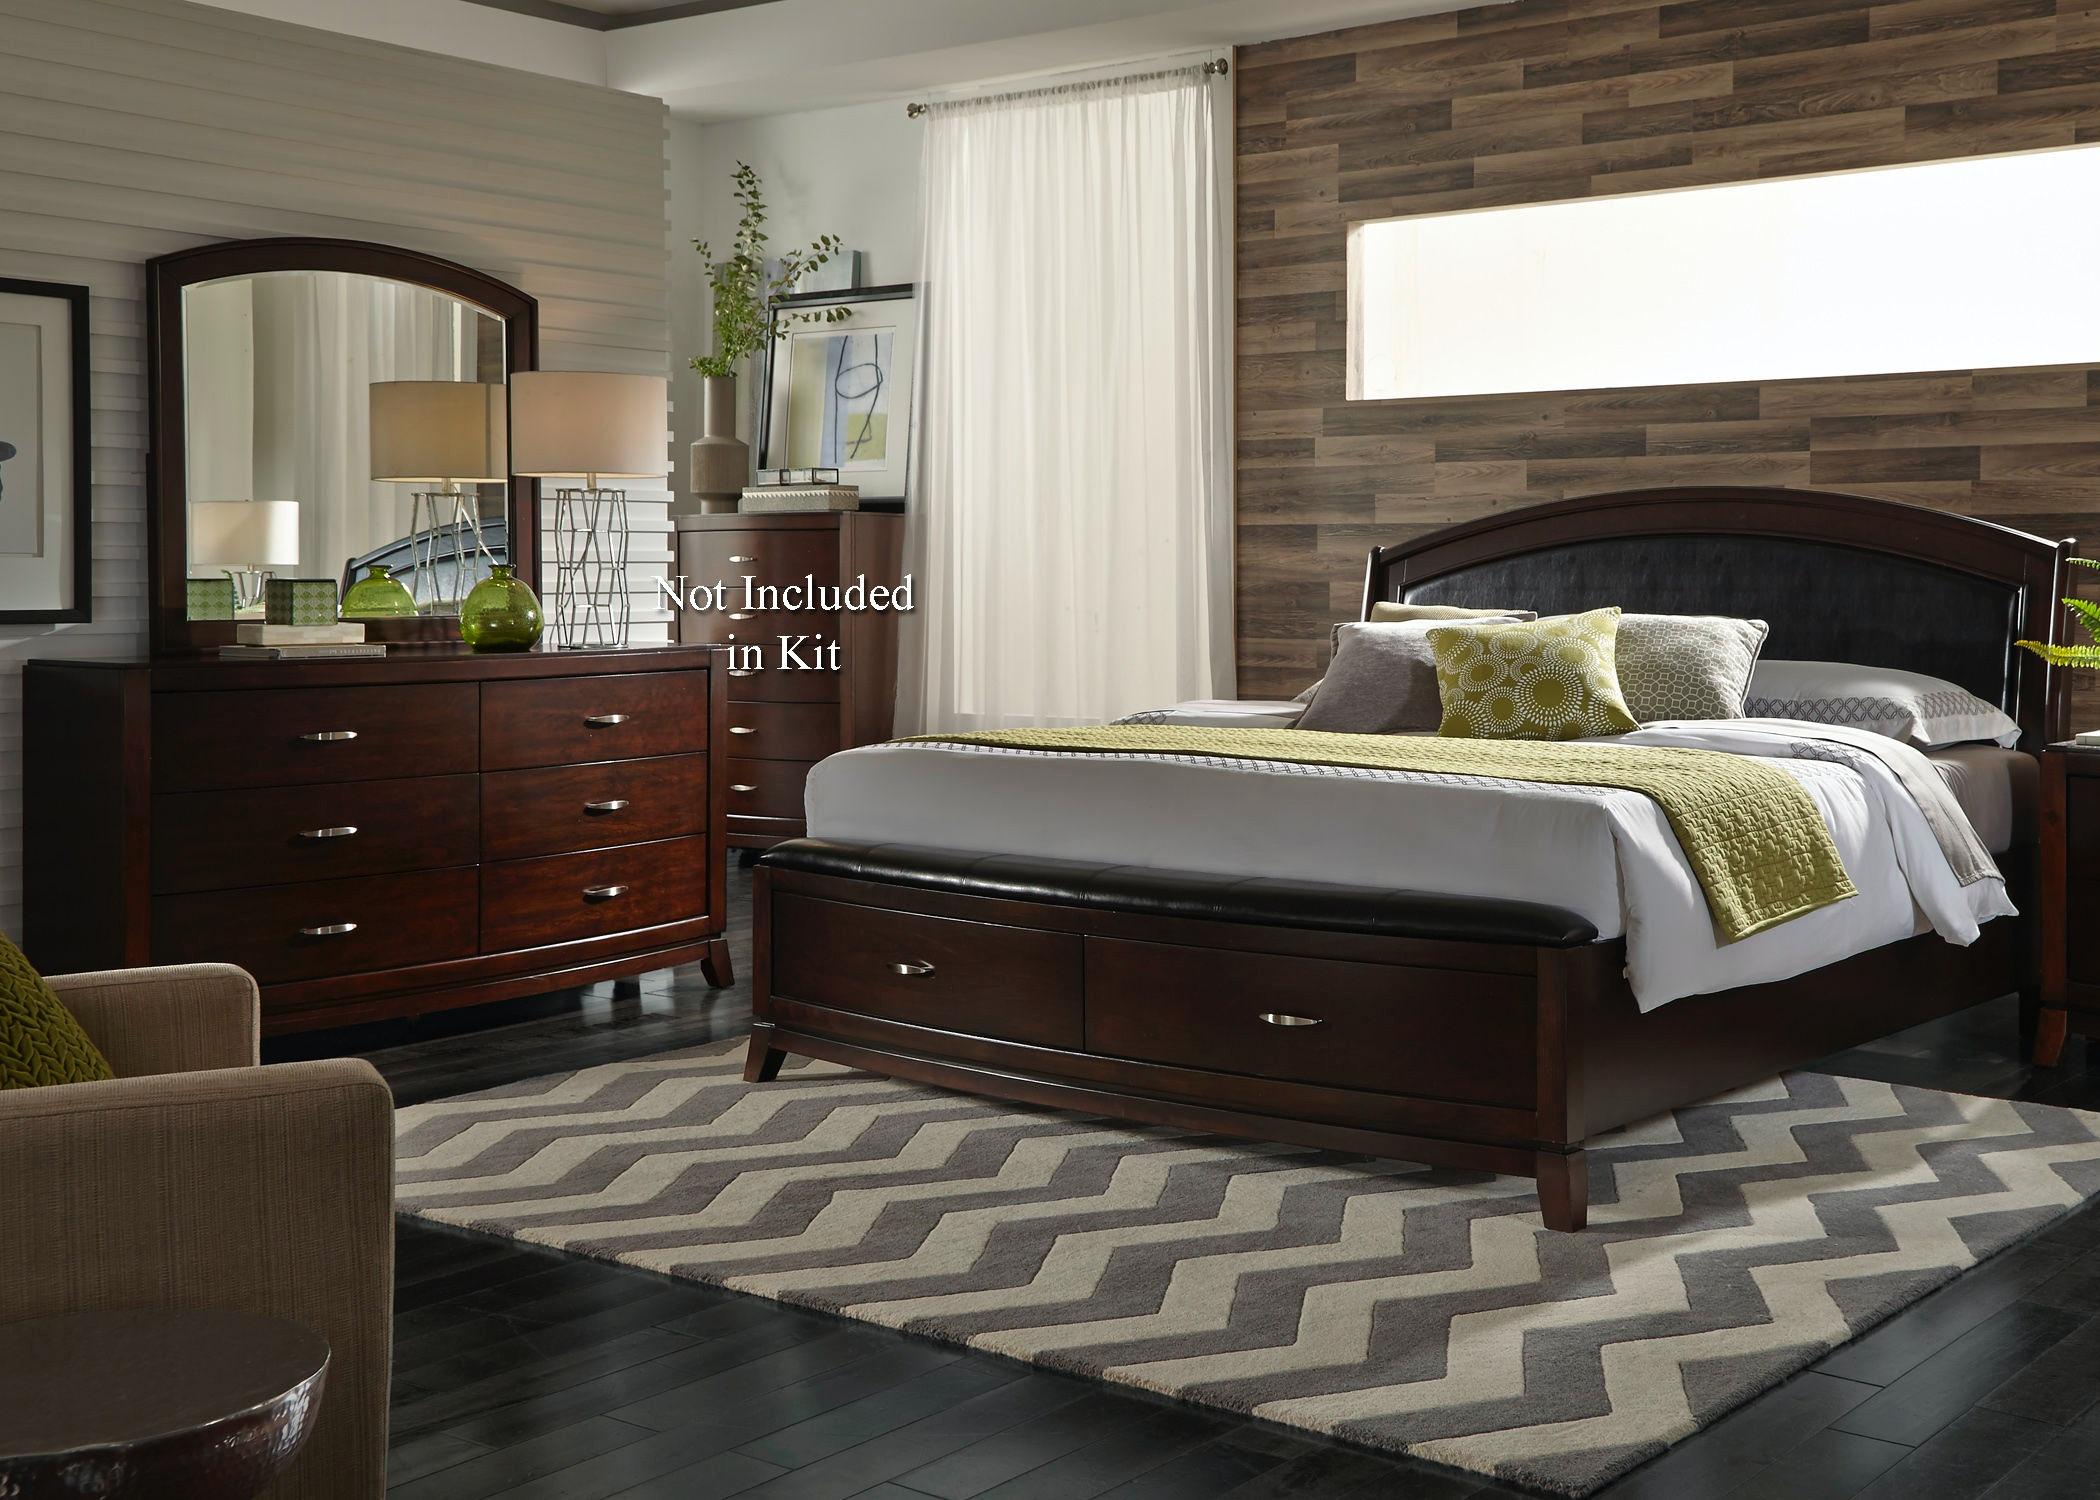 Liberty Furniture Queen Storage Bed Dresser and Mirror 505-BR-QSBDM & Liberty Furniture Bedroom Queen Storage Bed Dresser and Mirror 505 ...